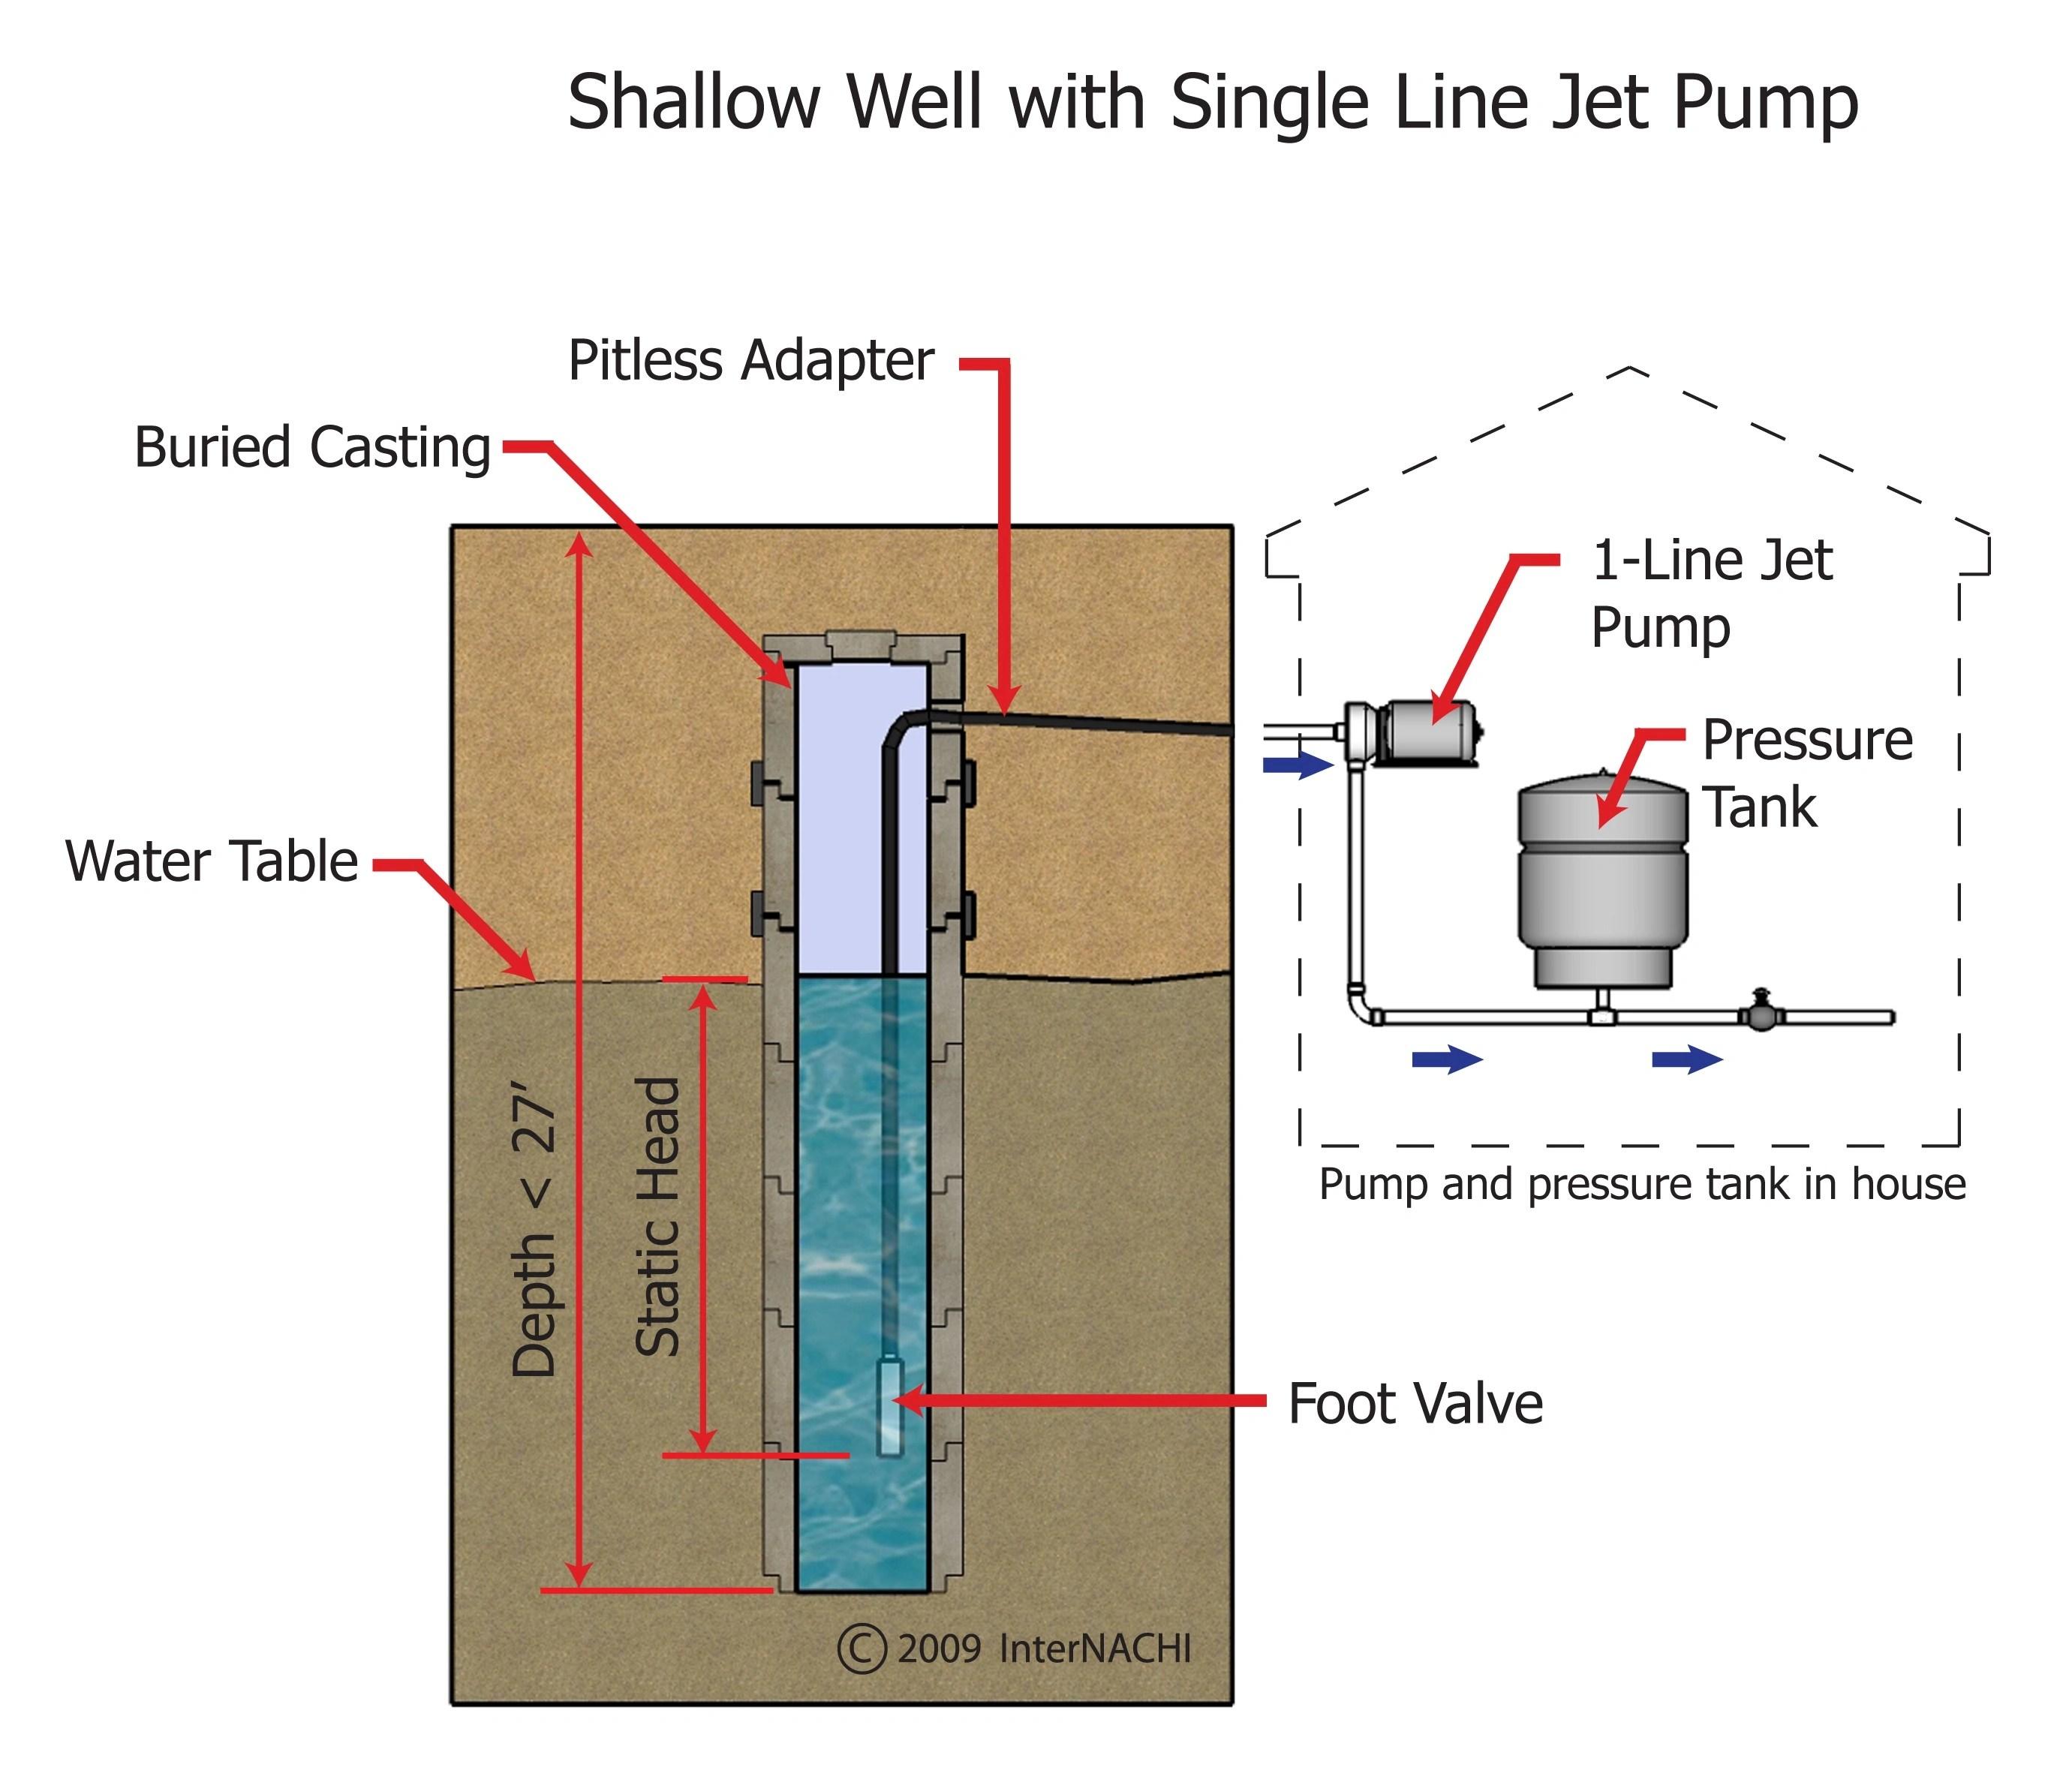 water well diagram schematic derbi drd 50 wiring internachi inspection graphics library plumbing  general